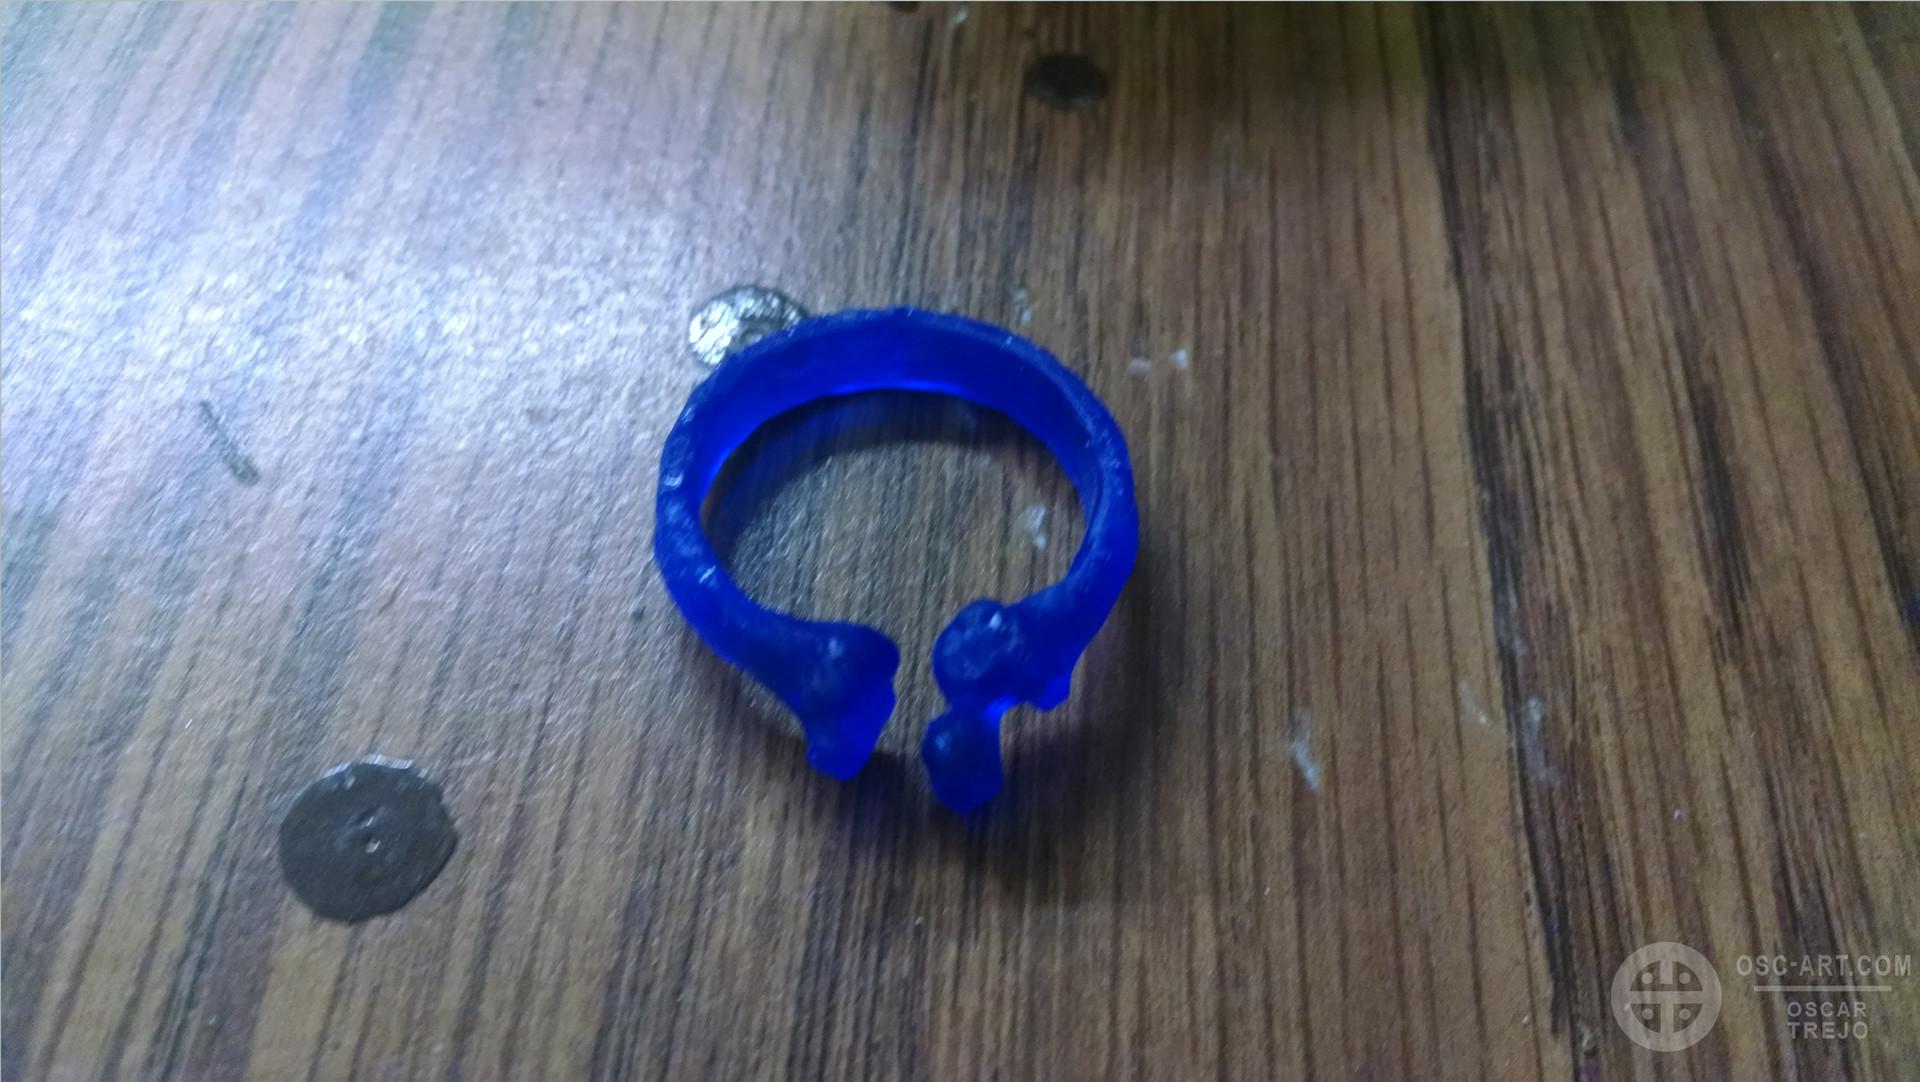 Oscar trejo femur ring print